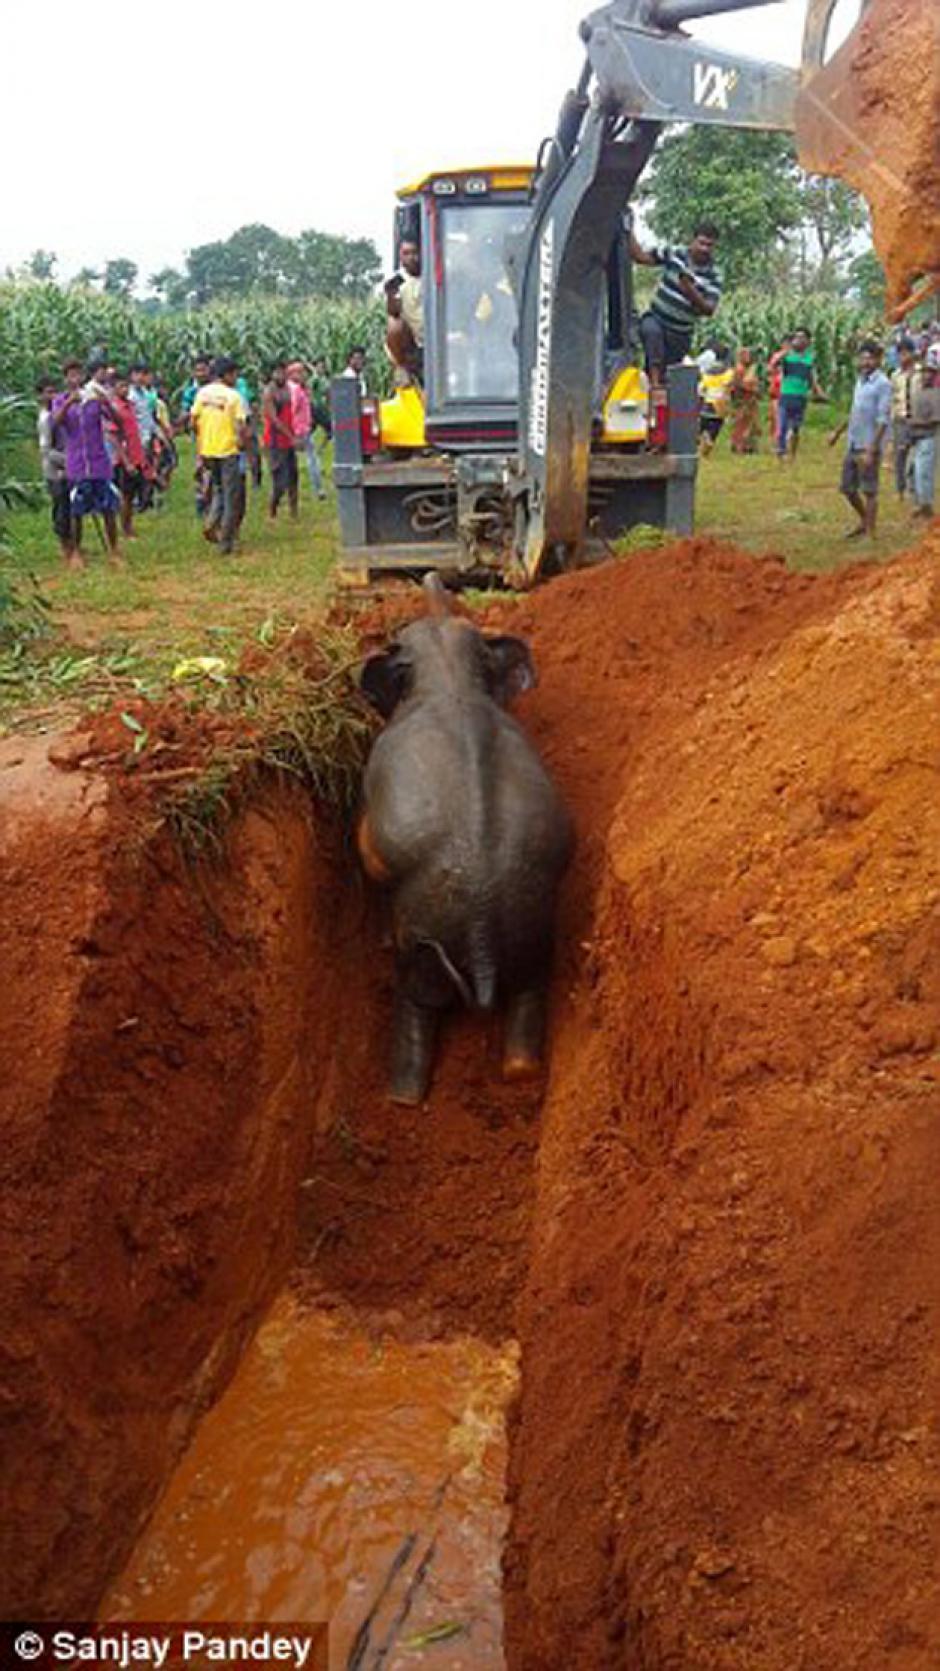 Con maquinaria pesada, los guardabosques rescataron al animal. (Foto: Daily Mail)